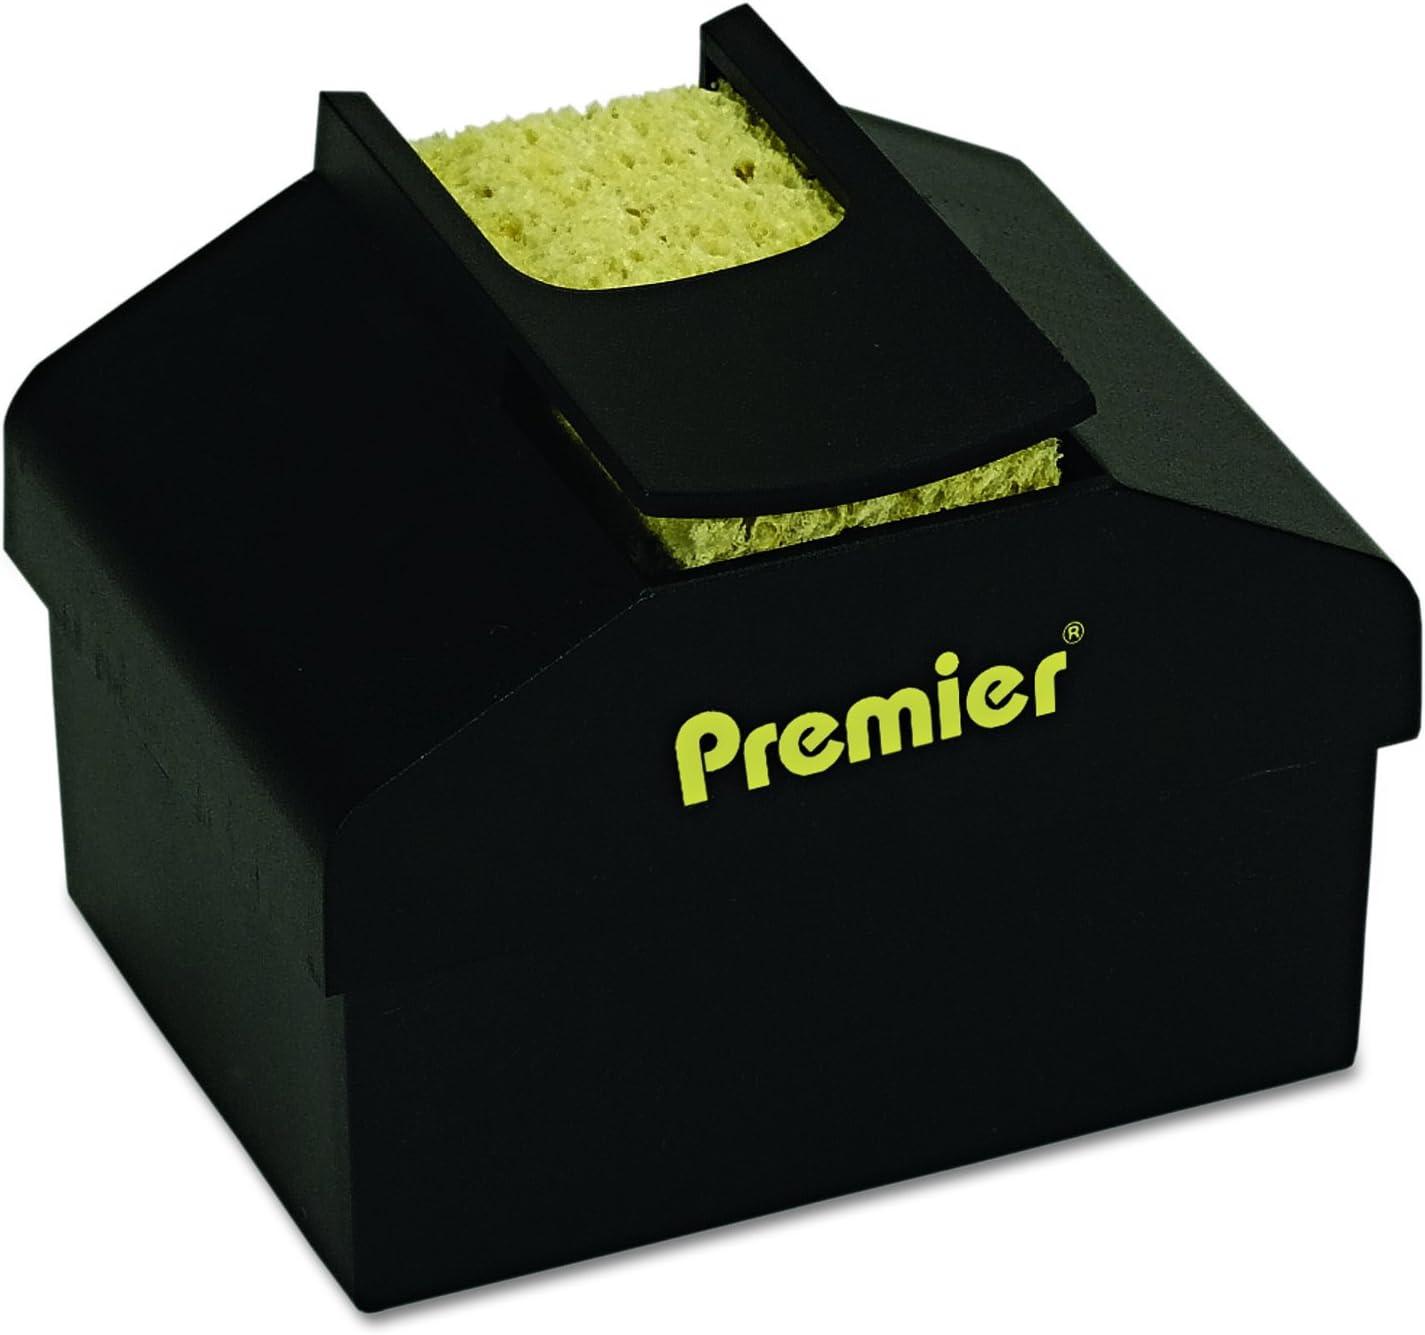 Martin Yale Premier AquaPad Envelope Black Moistener 2021 autumn and Very popular winter new PRELM3